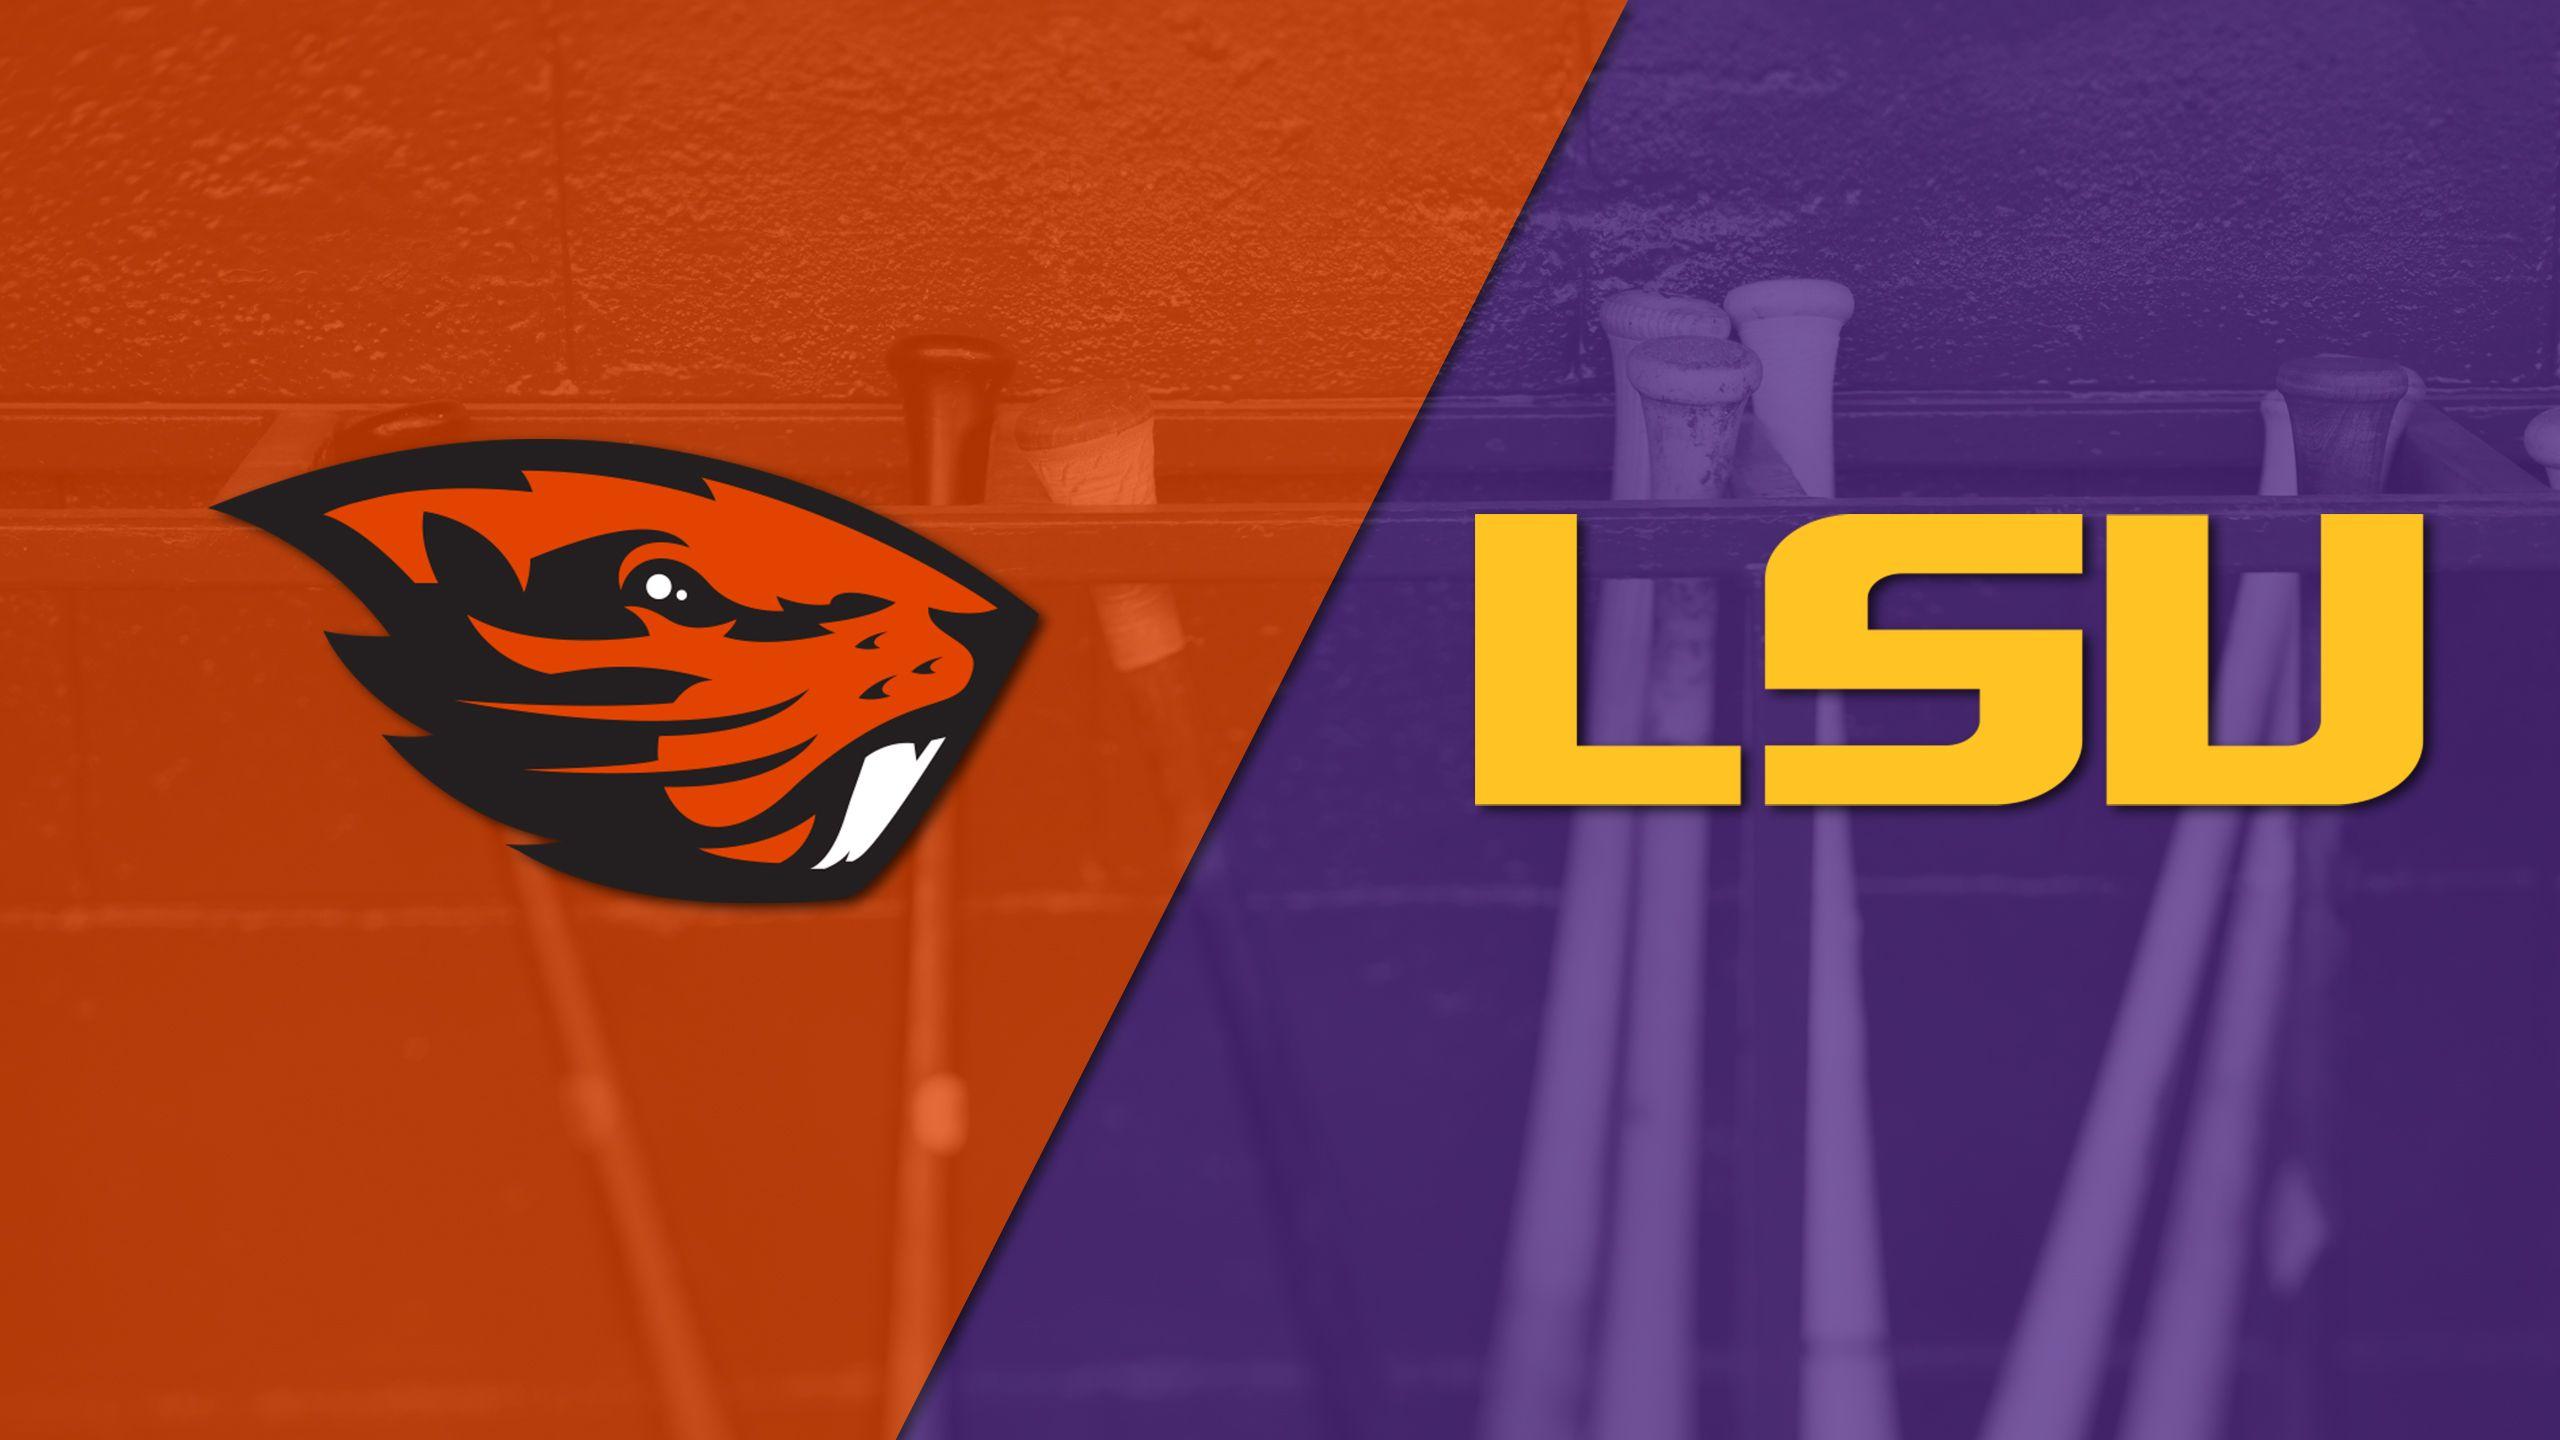 Multiview - #1 Oregon State vs. #4 LSU (Game 13) (College World Series)